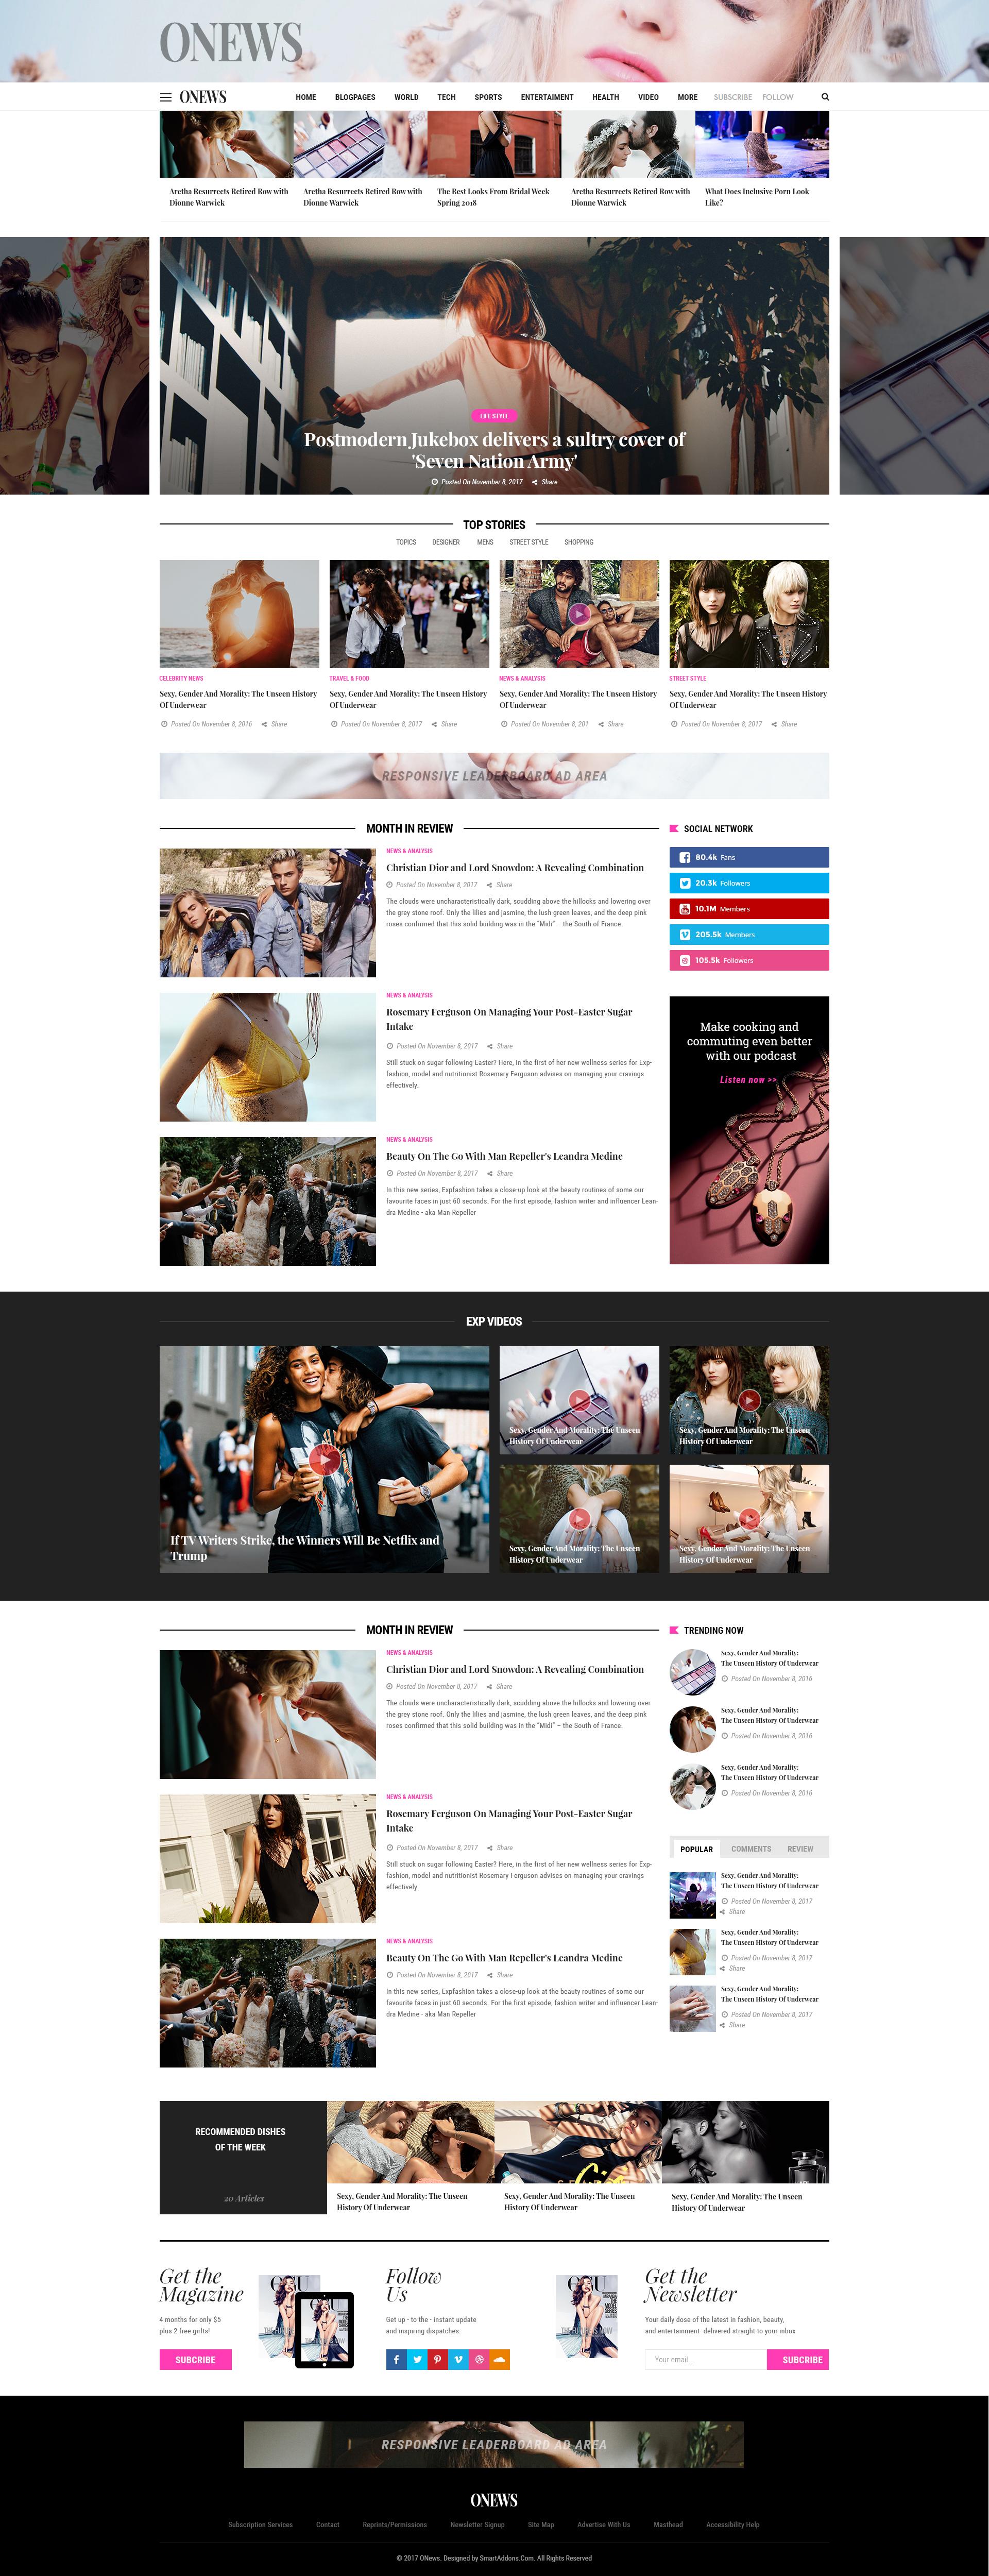 ONews - Modern Newspaper & Magazine WordPress Theme (Mobile Layout ...